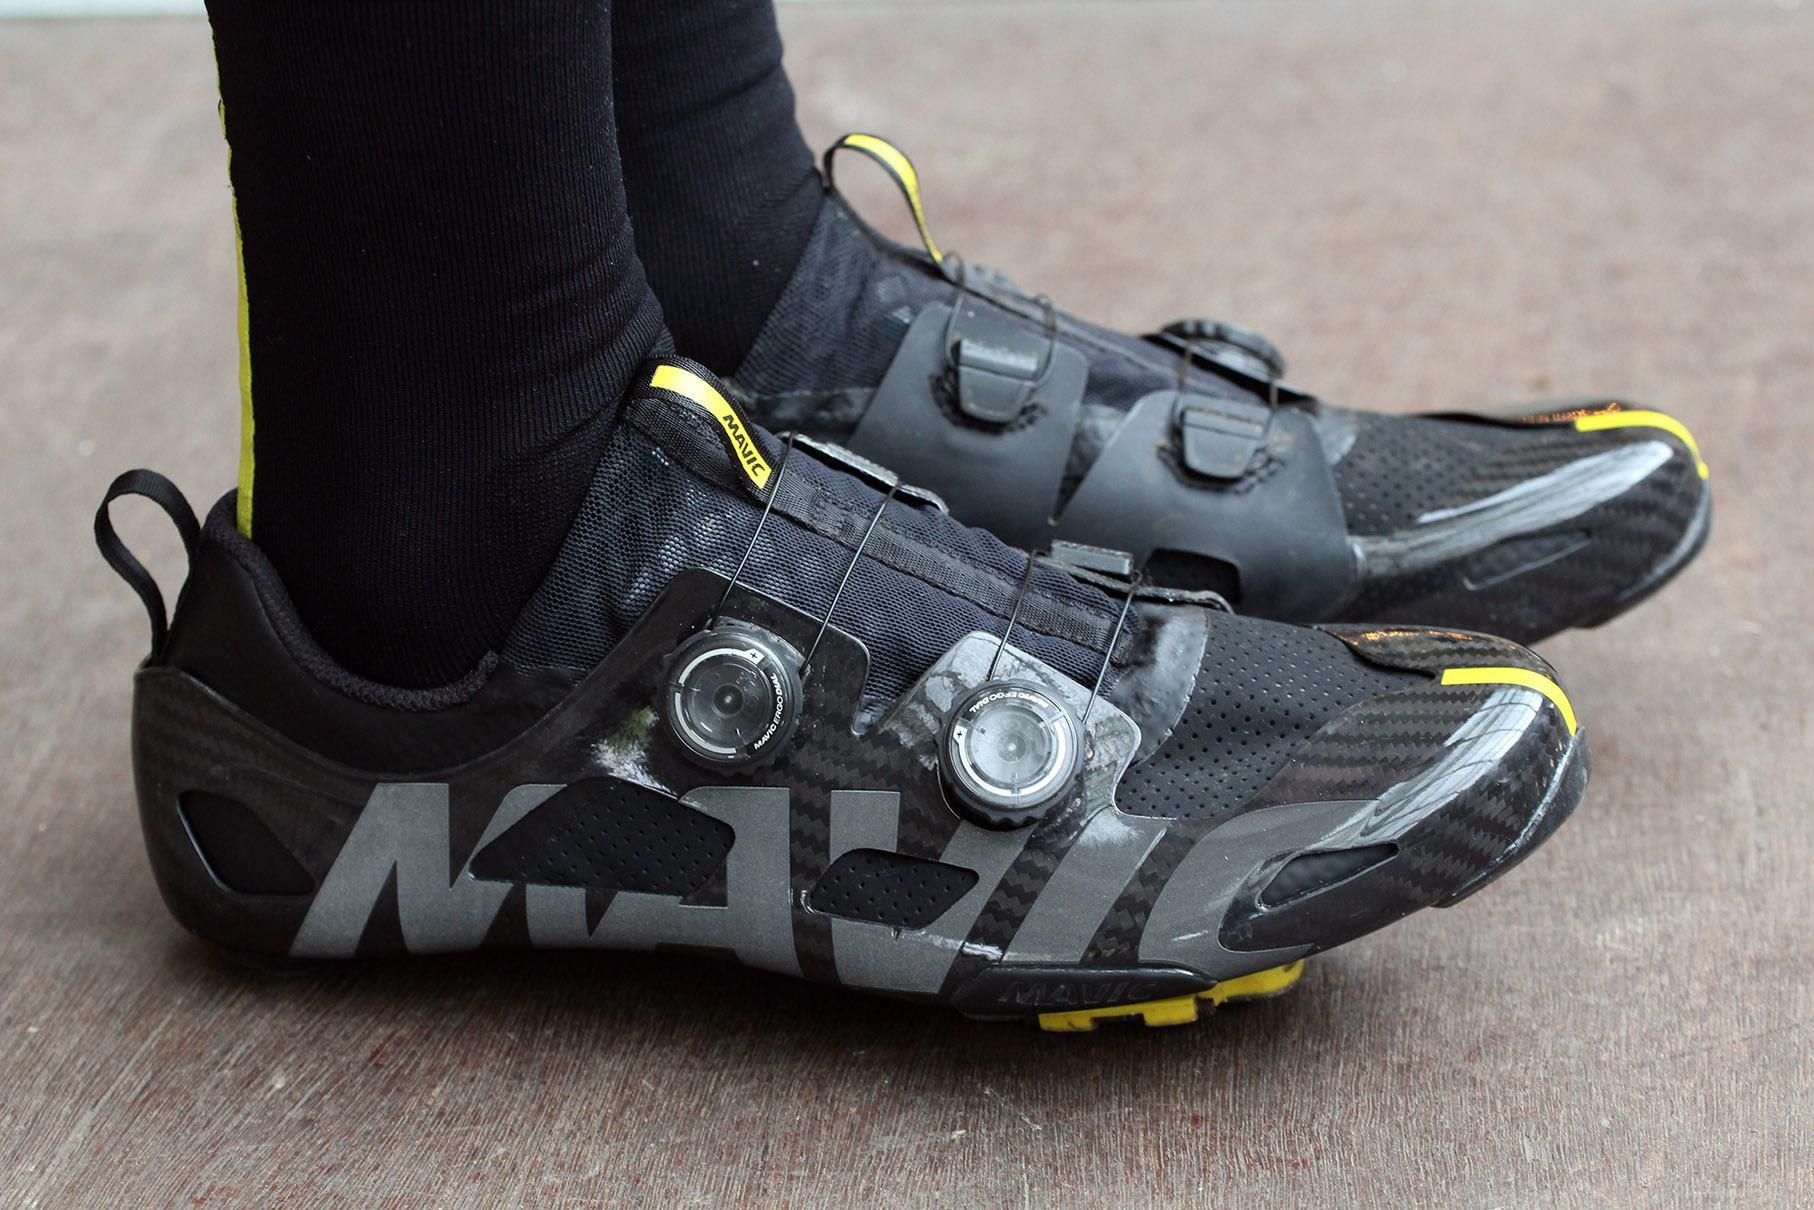 Review: Mavic Comete Ultimate shoes